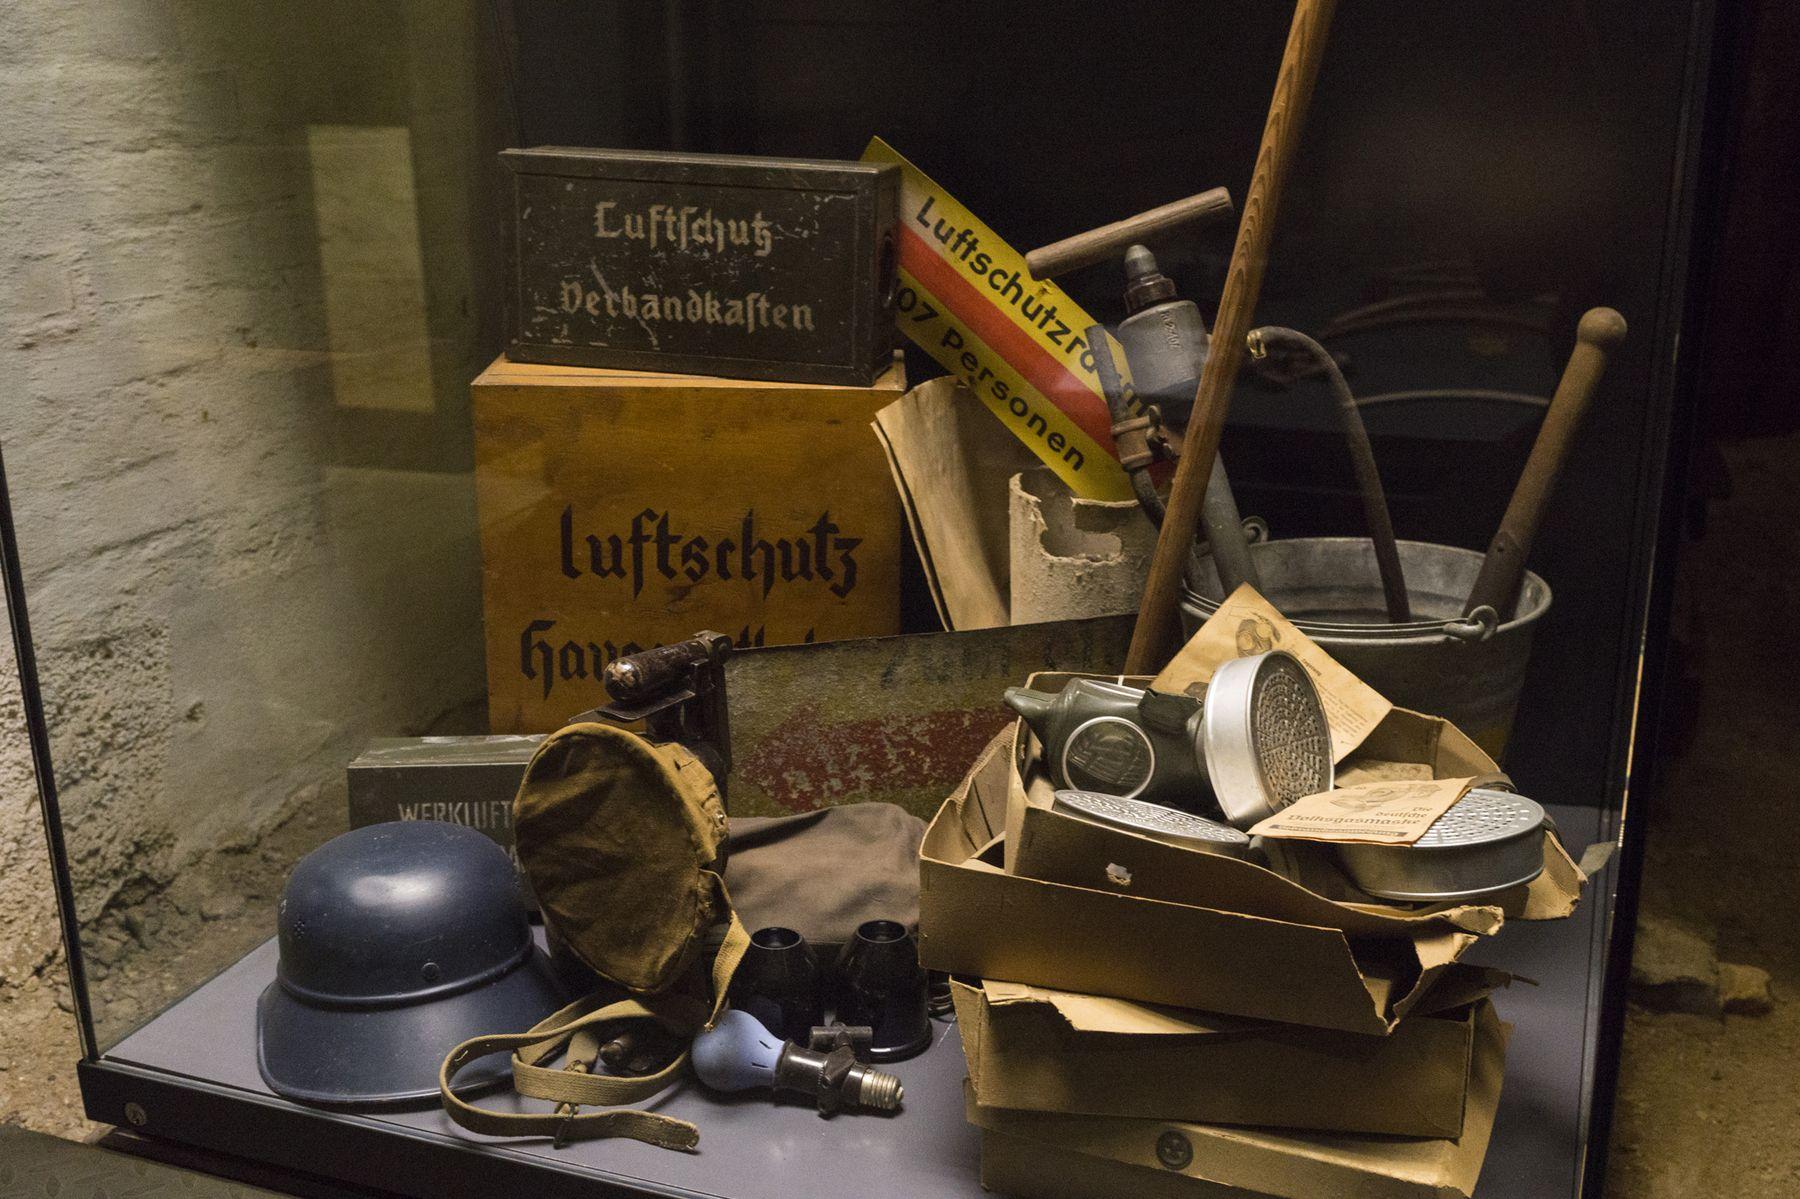 Heimatmuseum Reutlingen, ehemaliger Luftschutzkeller, Fotografin: Tina Kühnlein